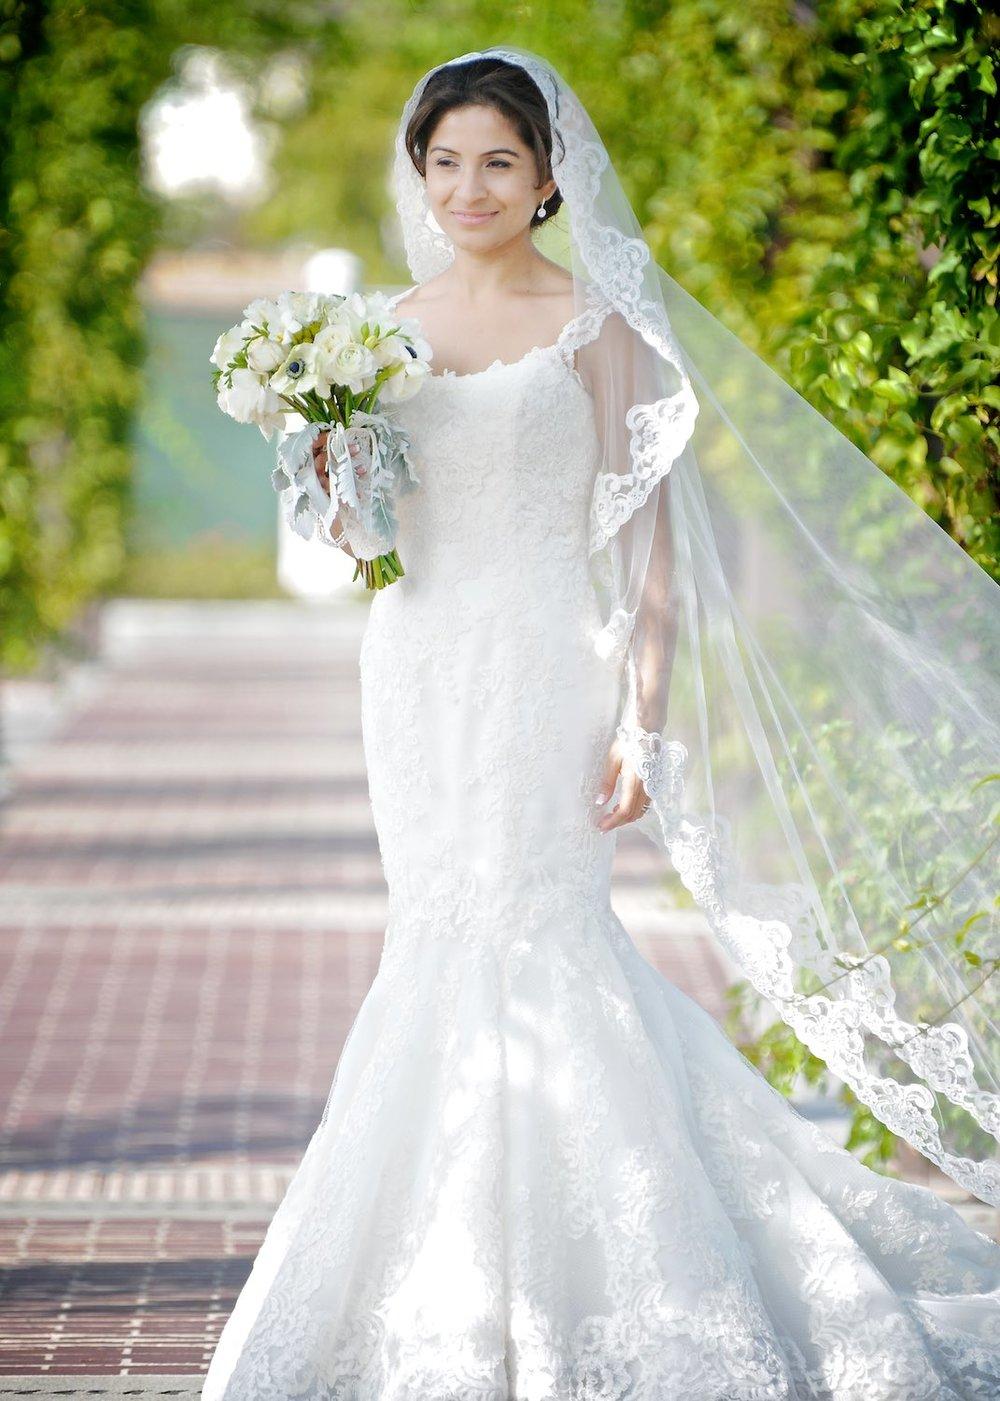 irvine-wedding-michal-pfeil-17.jpg